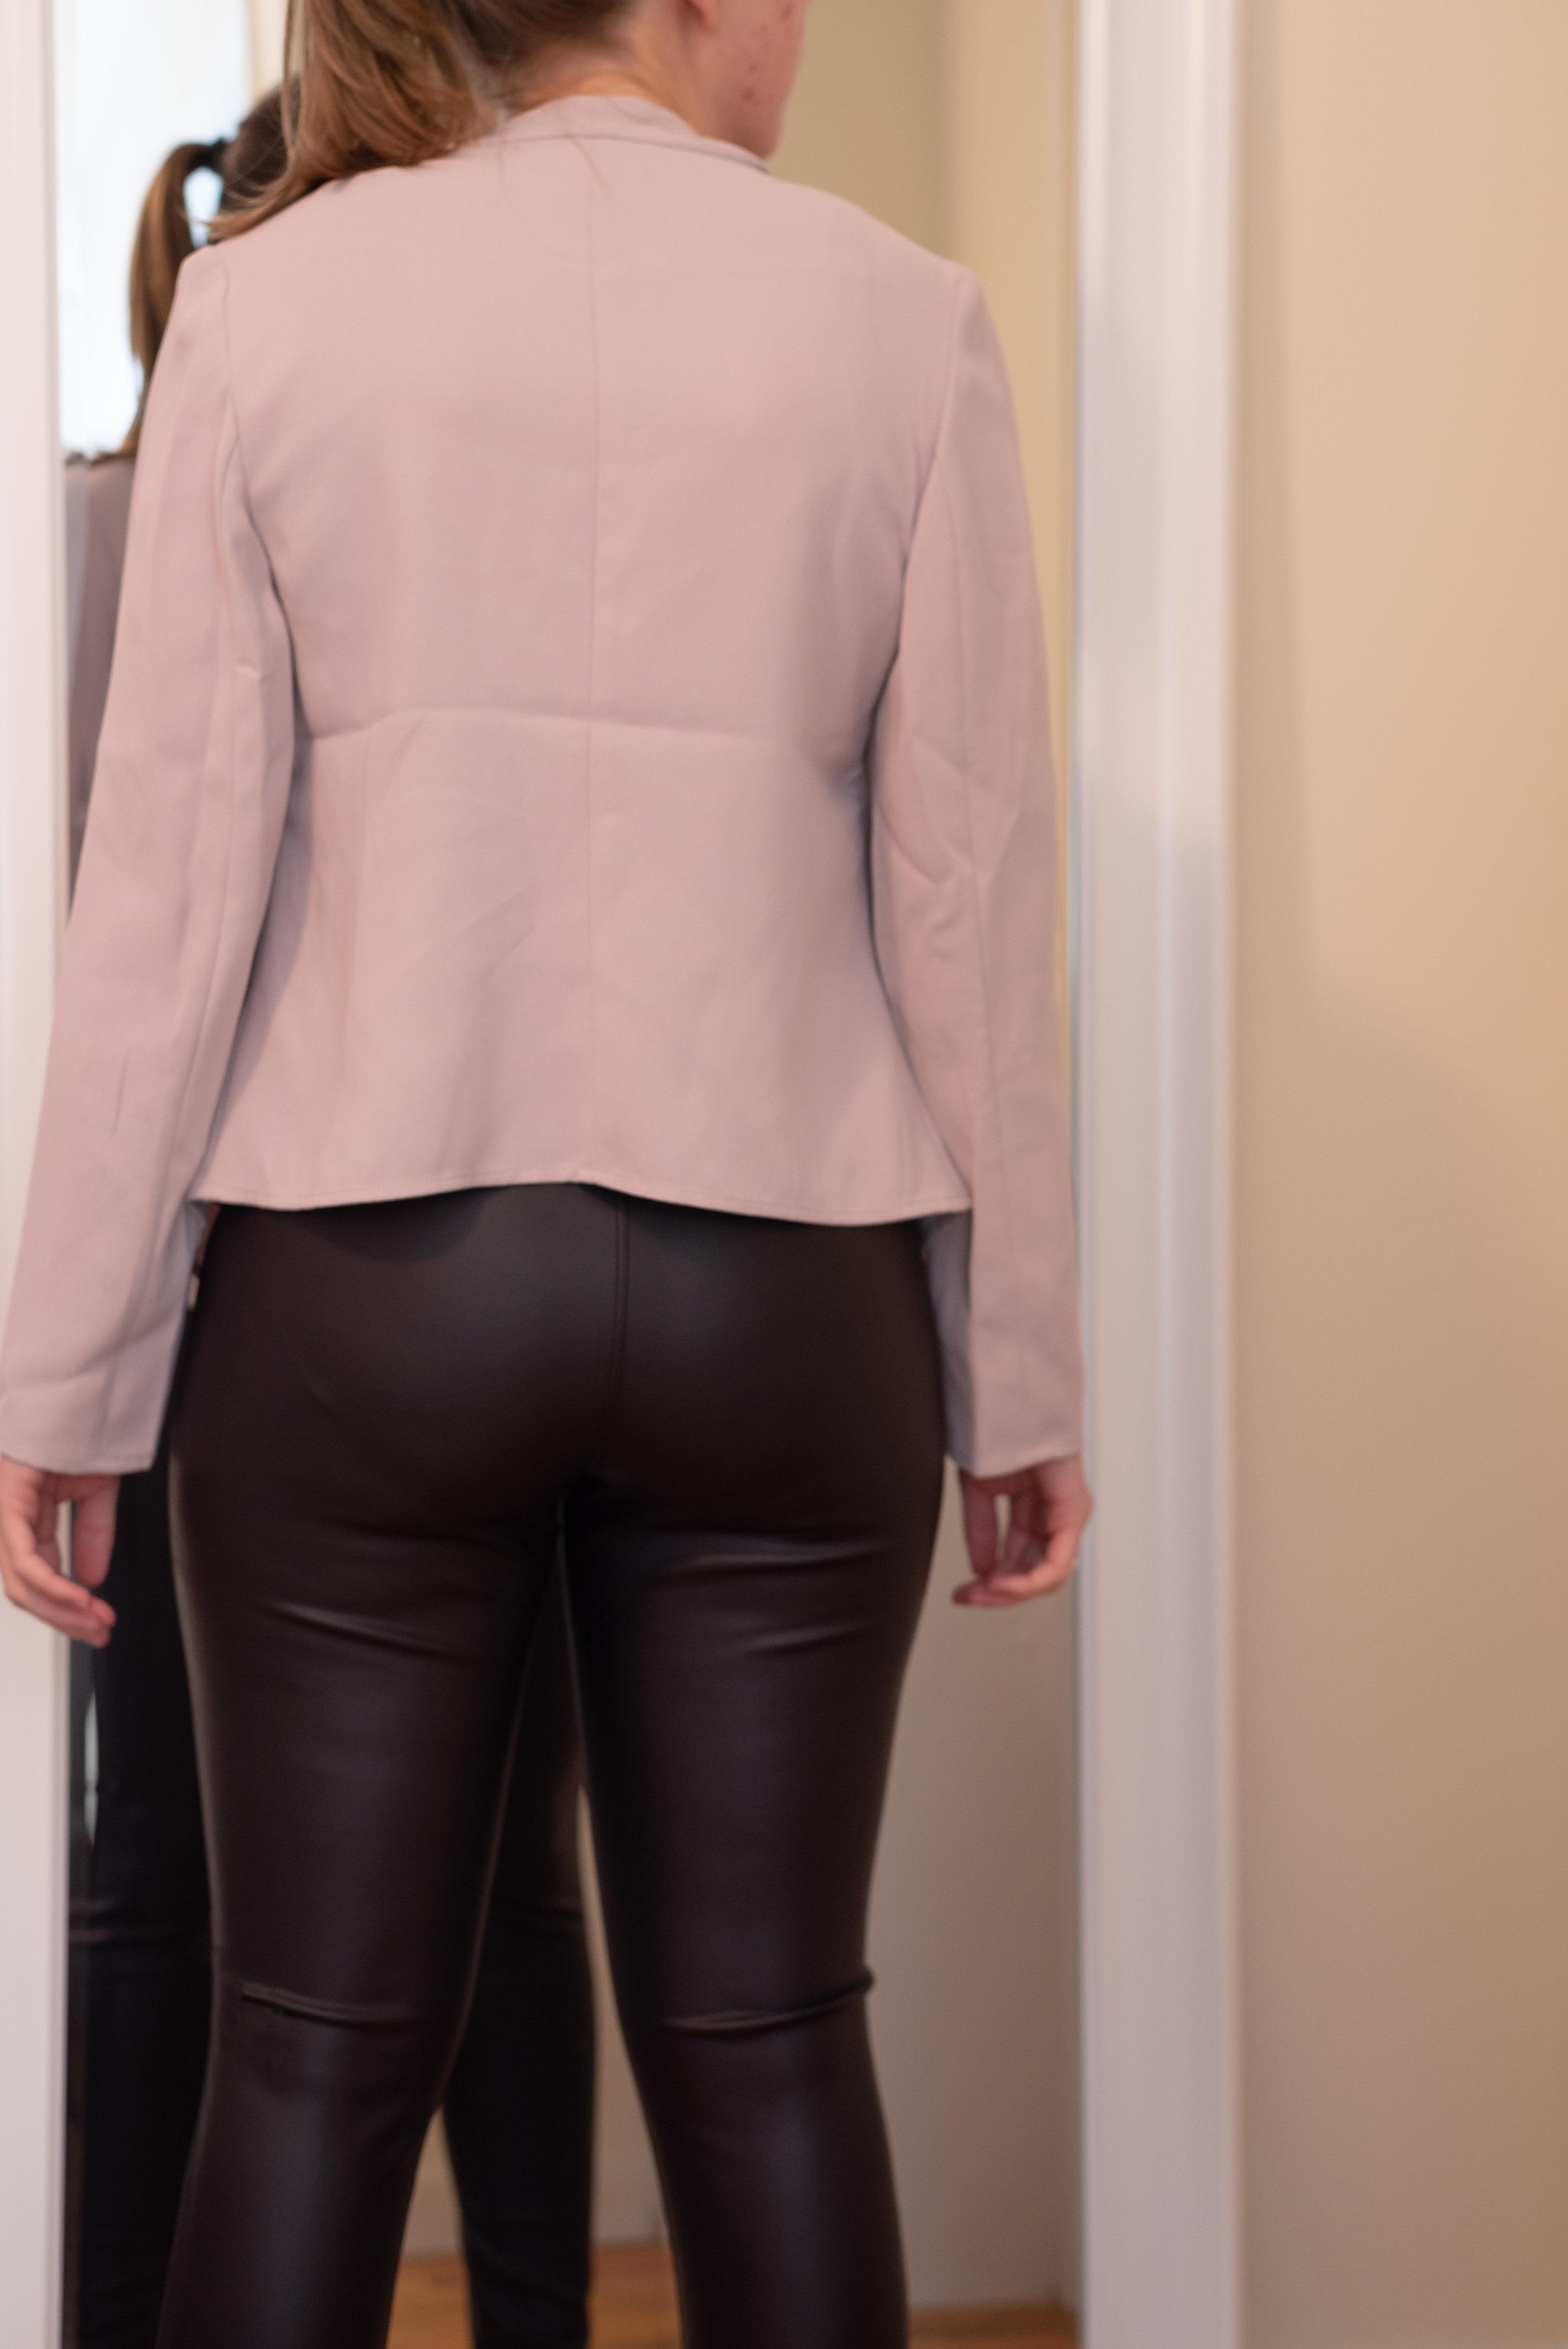 Express Petite Drape Open Front Jacket - Size S